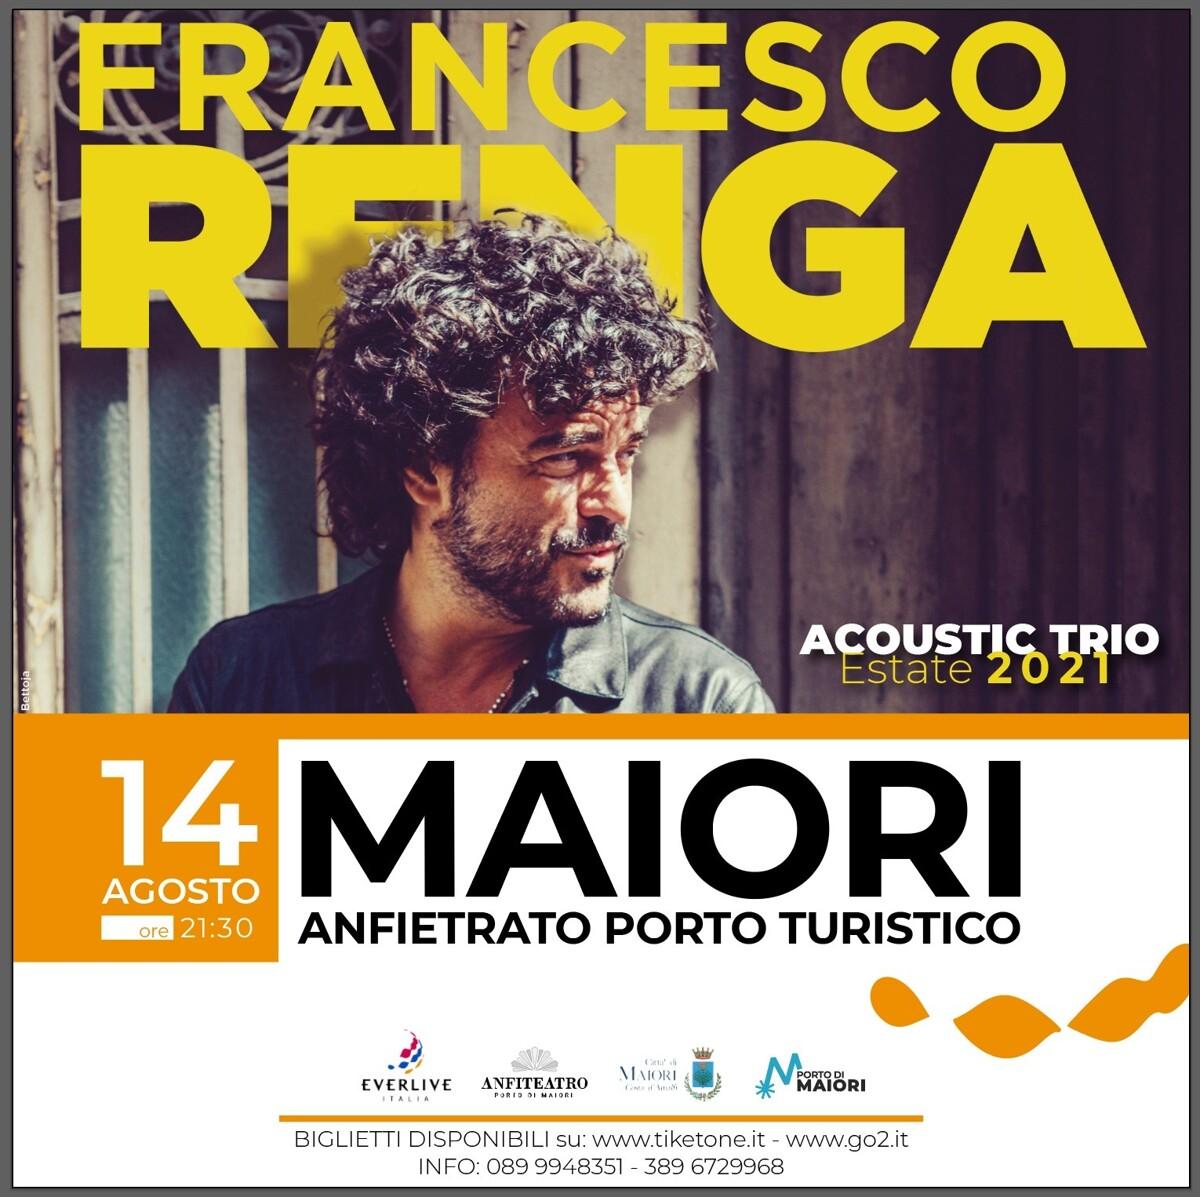 Maiori, arriva Francesco Renga: accordo Everlive – Travelmar